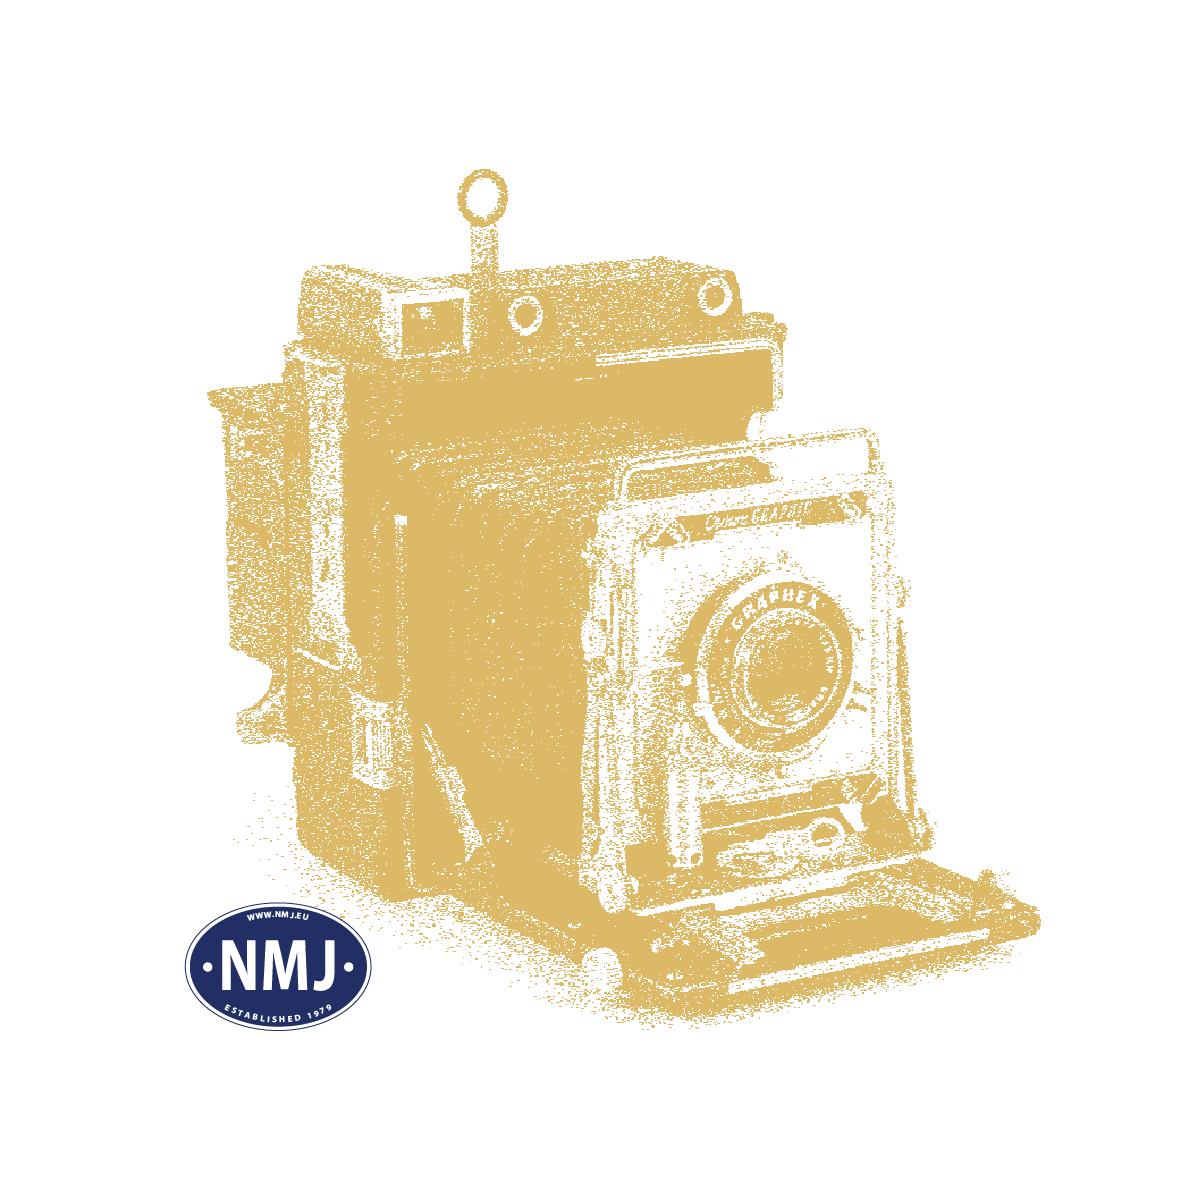 "NMJT506.305 - NMJ Topline Gbs 150 0 230-0 ""Adresseavisen"" Güterwagen der NSB"